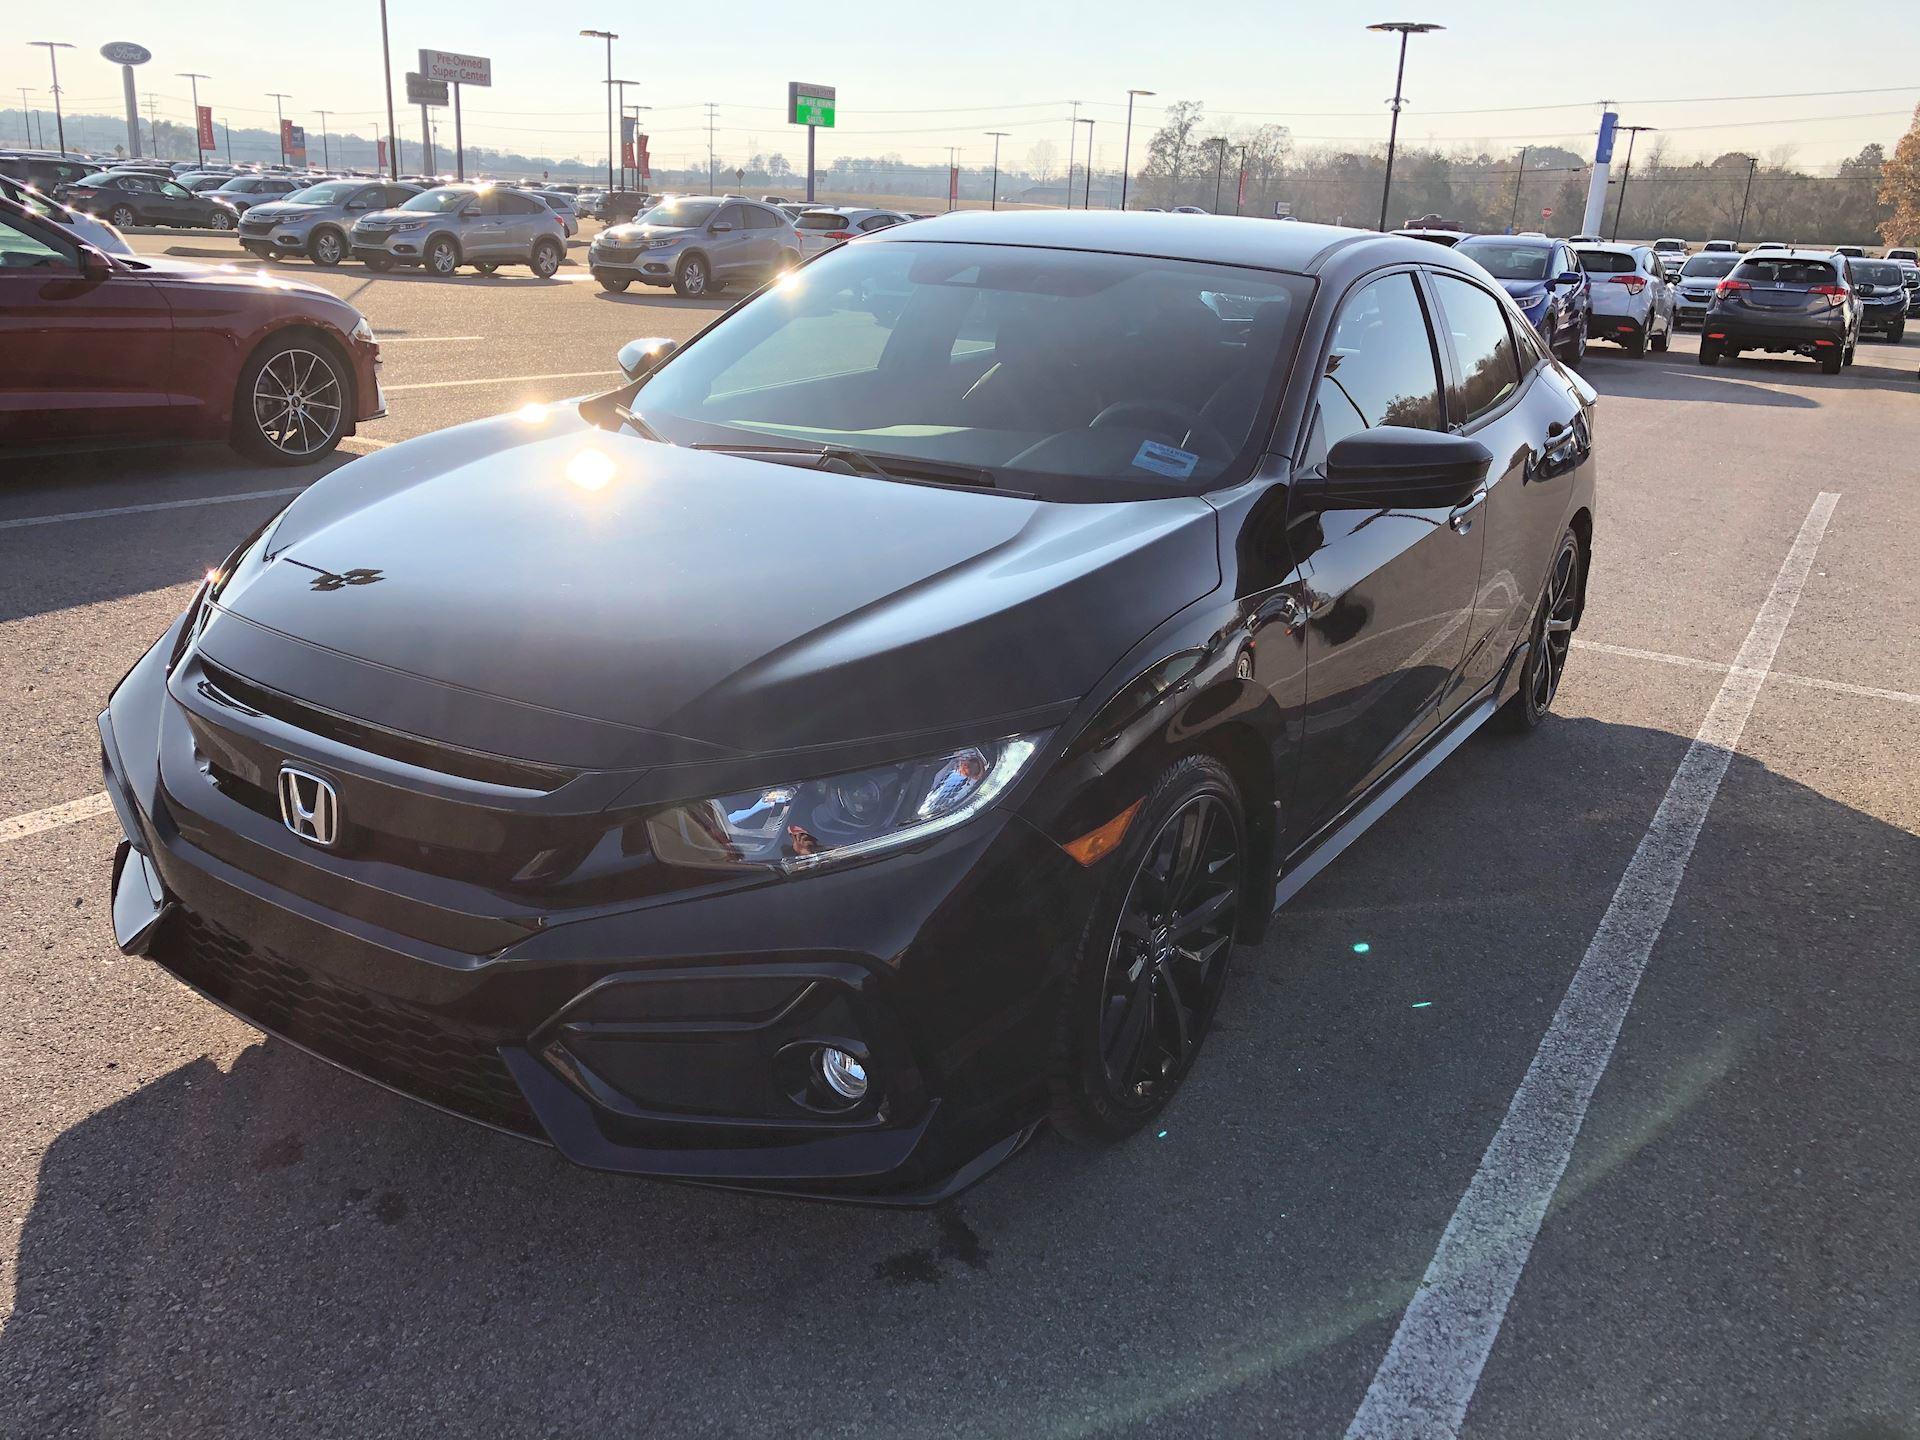 Clarksville TN Jenkins-Wynne-Ford-Honda-Lincoln Honda  Dealer Reviews   2020 Honda Civic-Hatchback